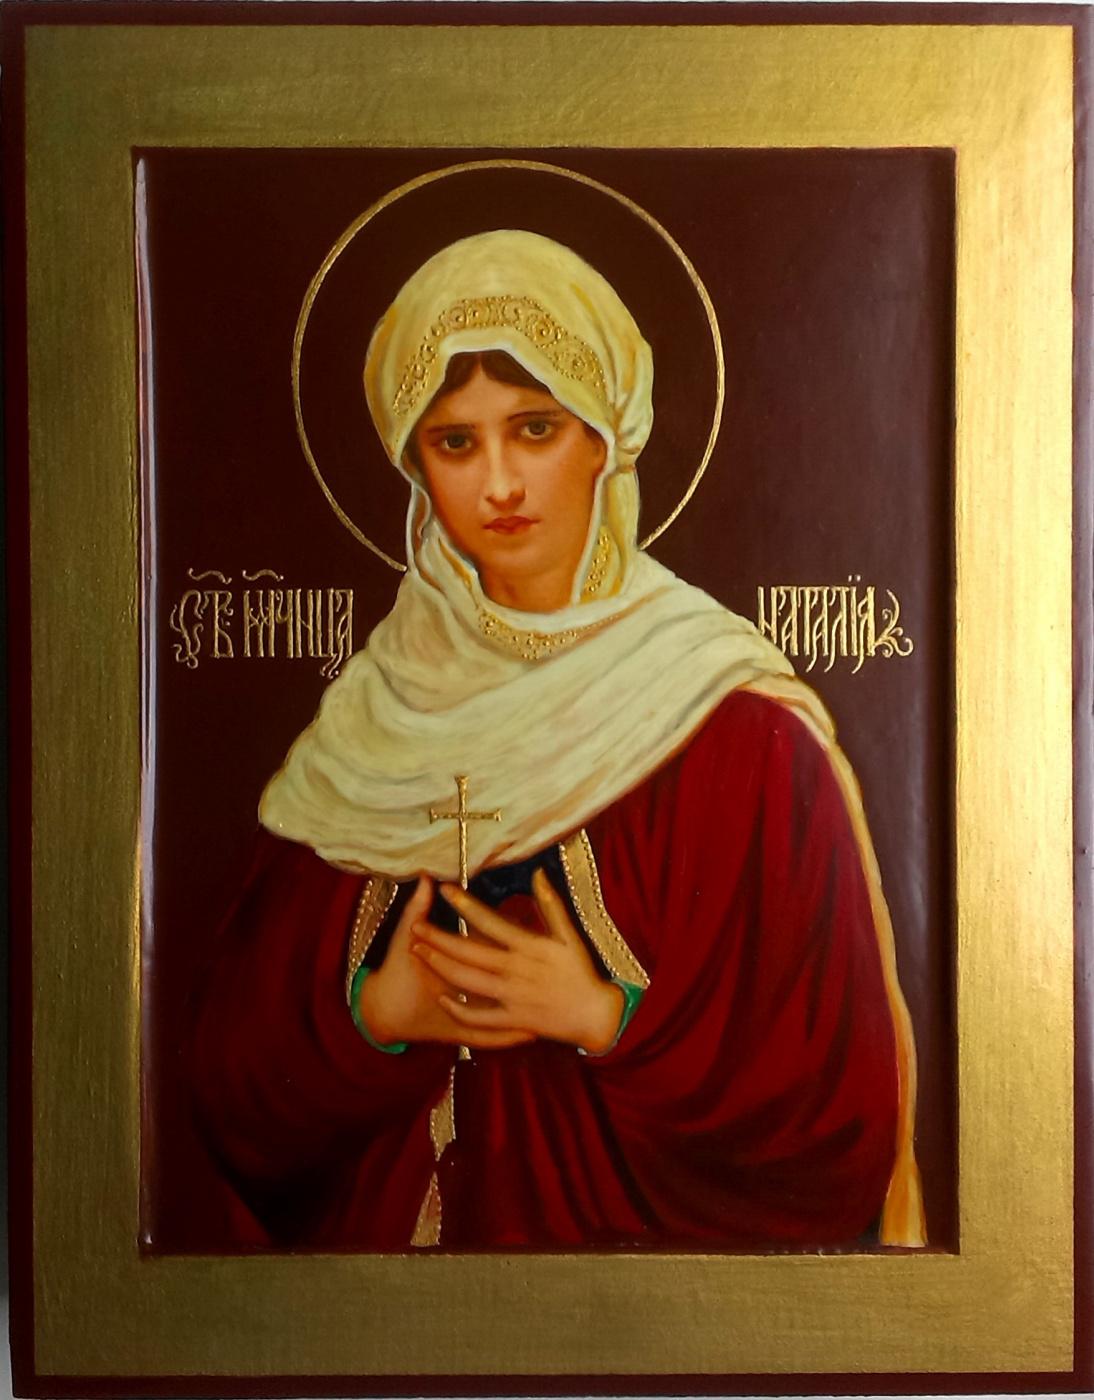 Gennady Alekseevich Stepanov. Icon of the Holy Martyr Natalia